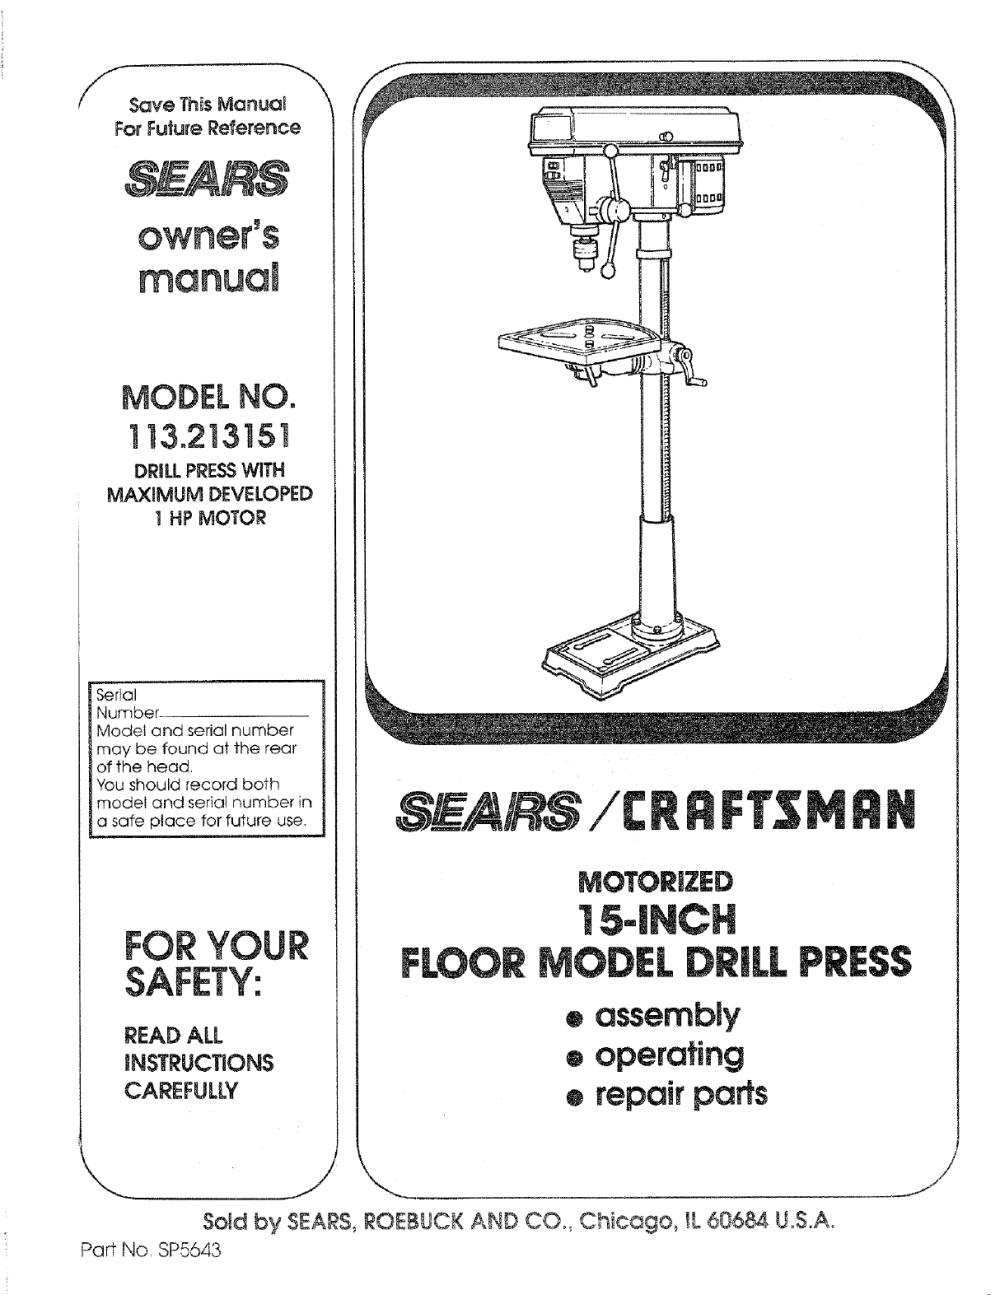 medium resolution of craftsman 113213151 user manual 15 floor drill press manuals and guides l0804024